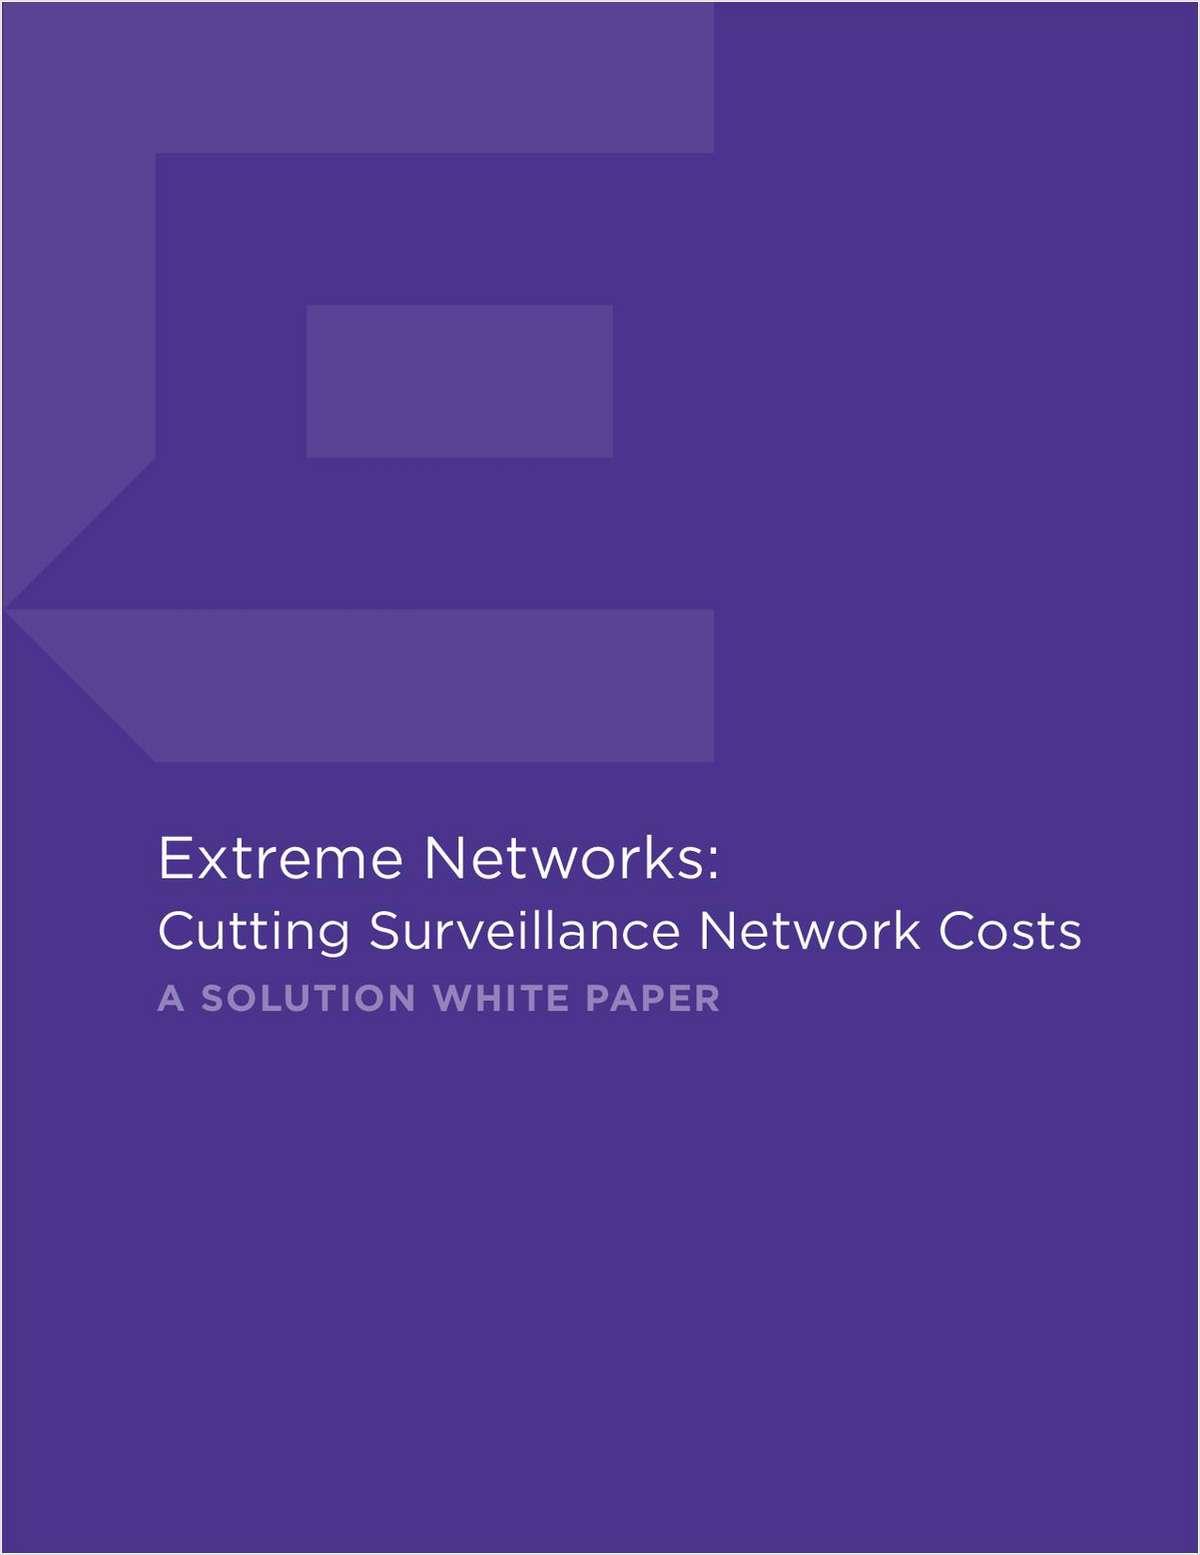 Cutting Surveillance Network Costs